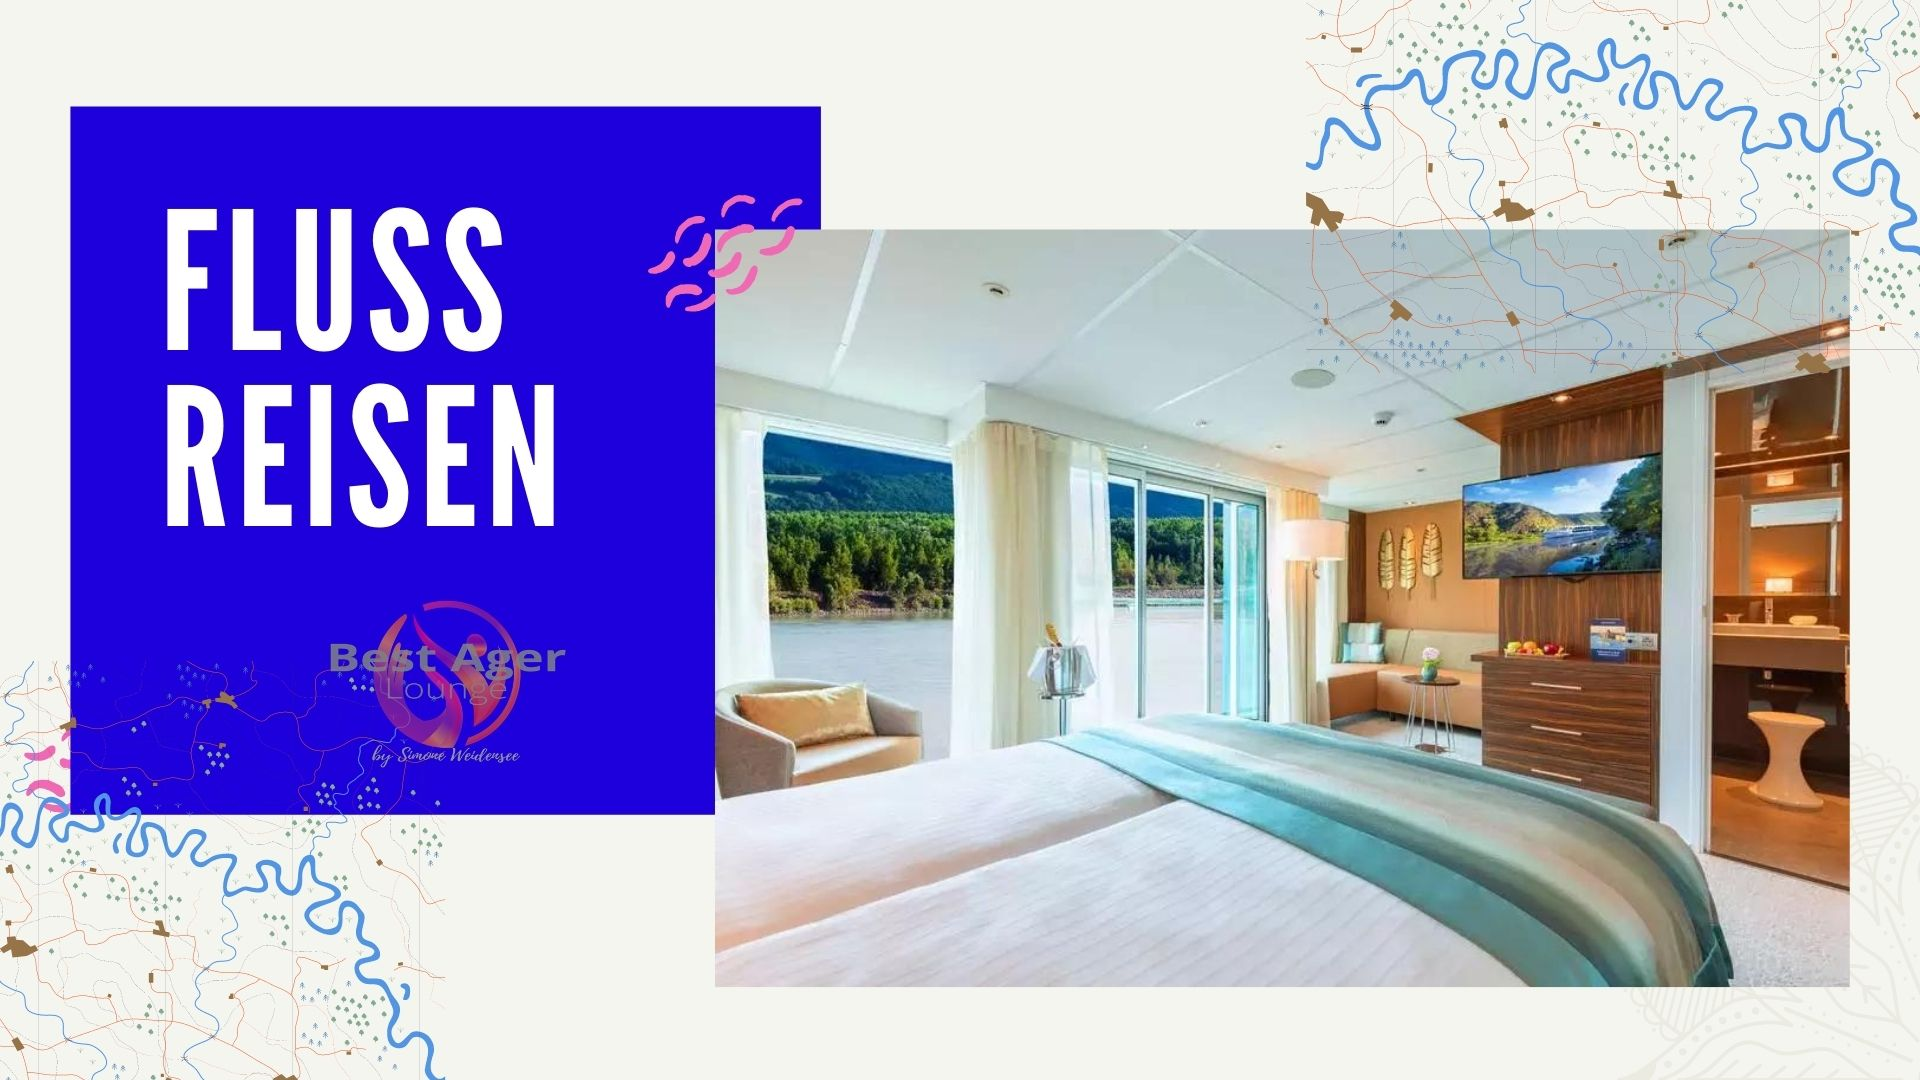 Last Minute Flusskreuzfahrten, Flussreisen2020, Flusskreuzfahrt, Lifestyle50Plus, Last Minute, Best Ager Lounge,